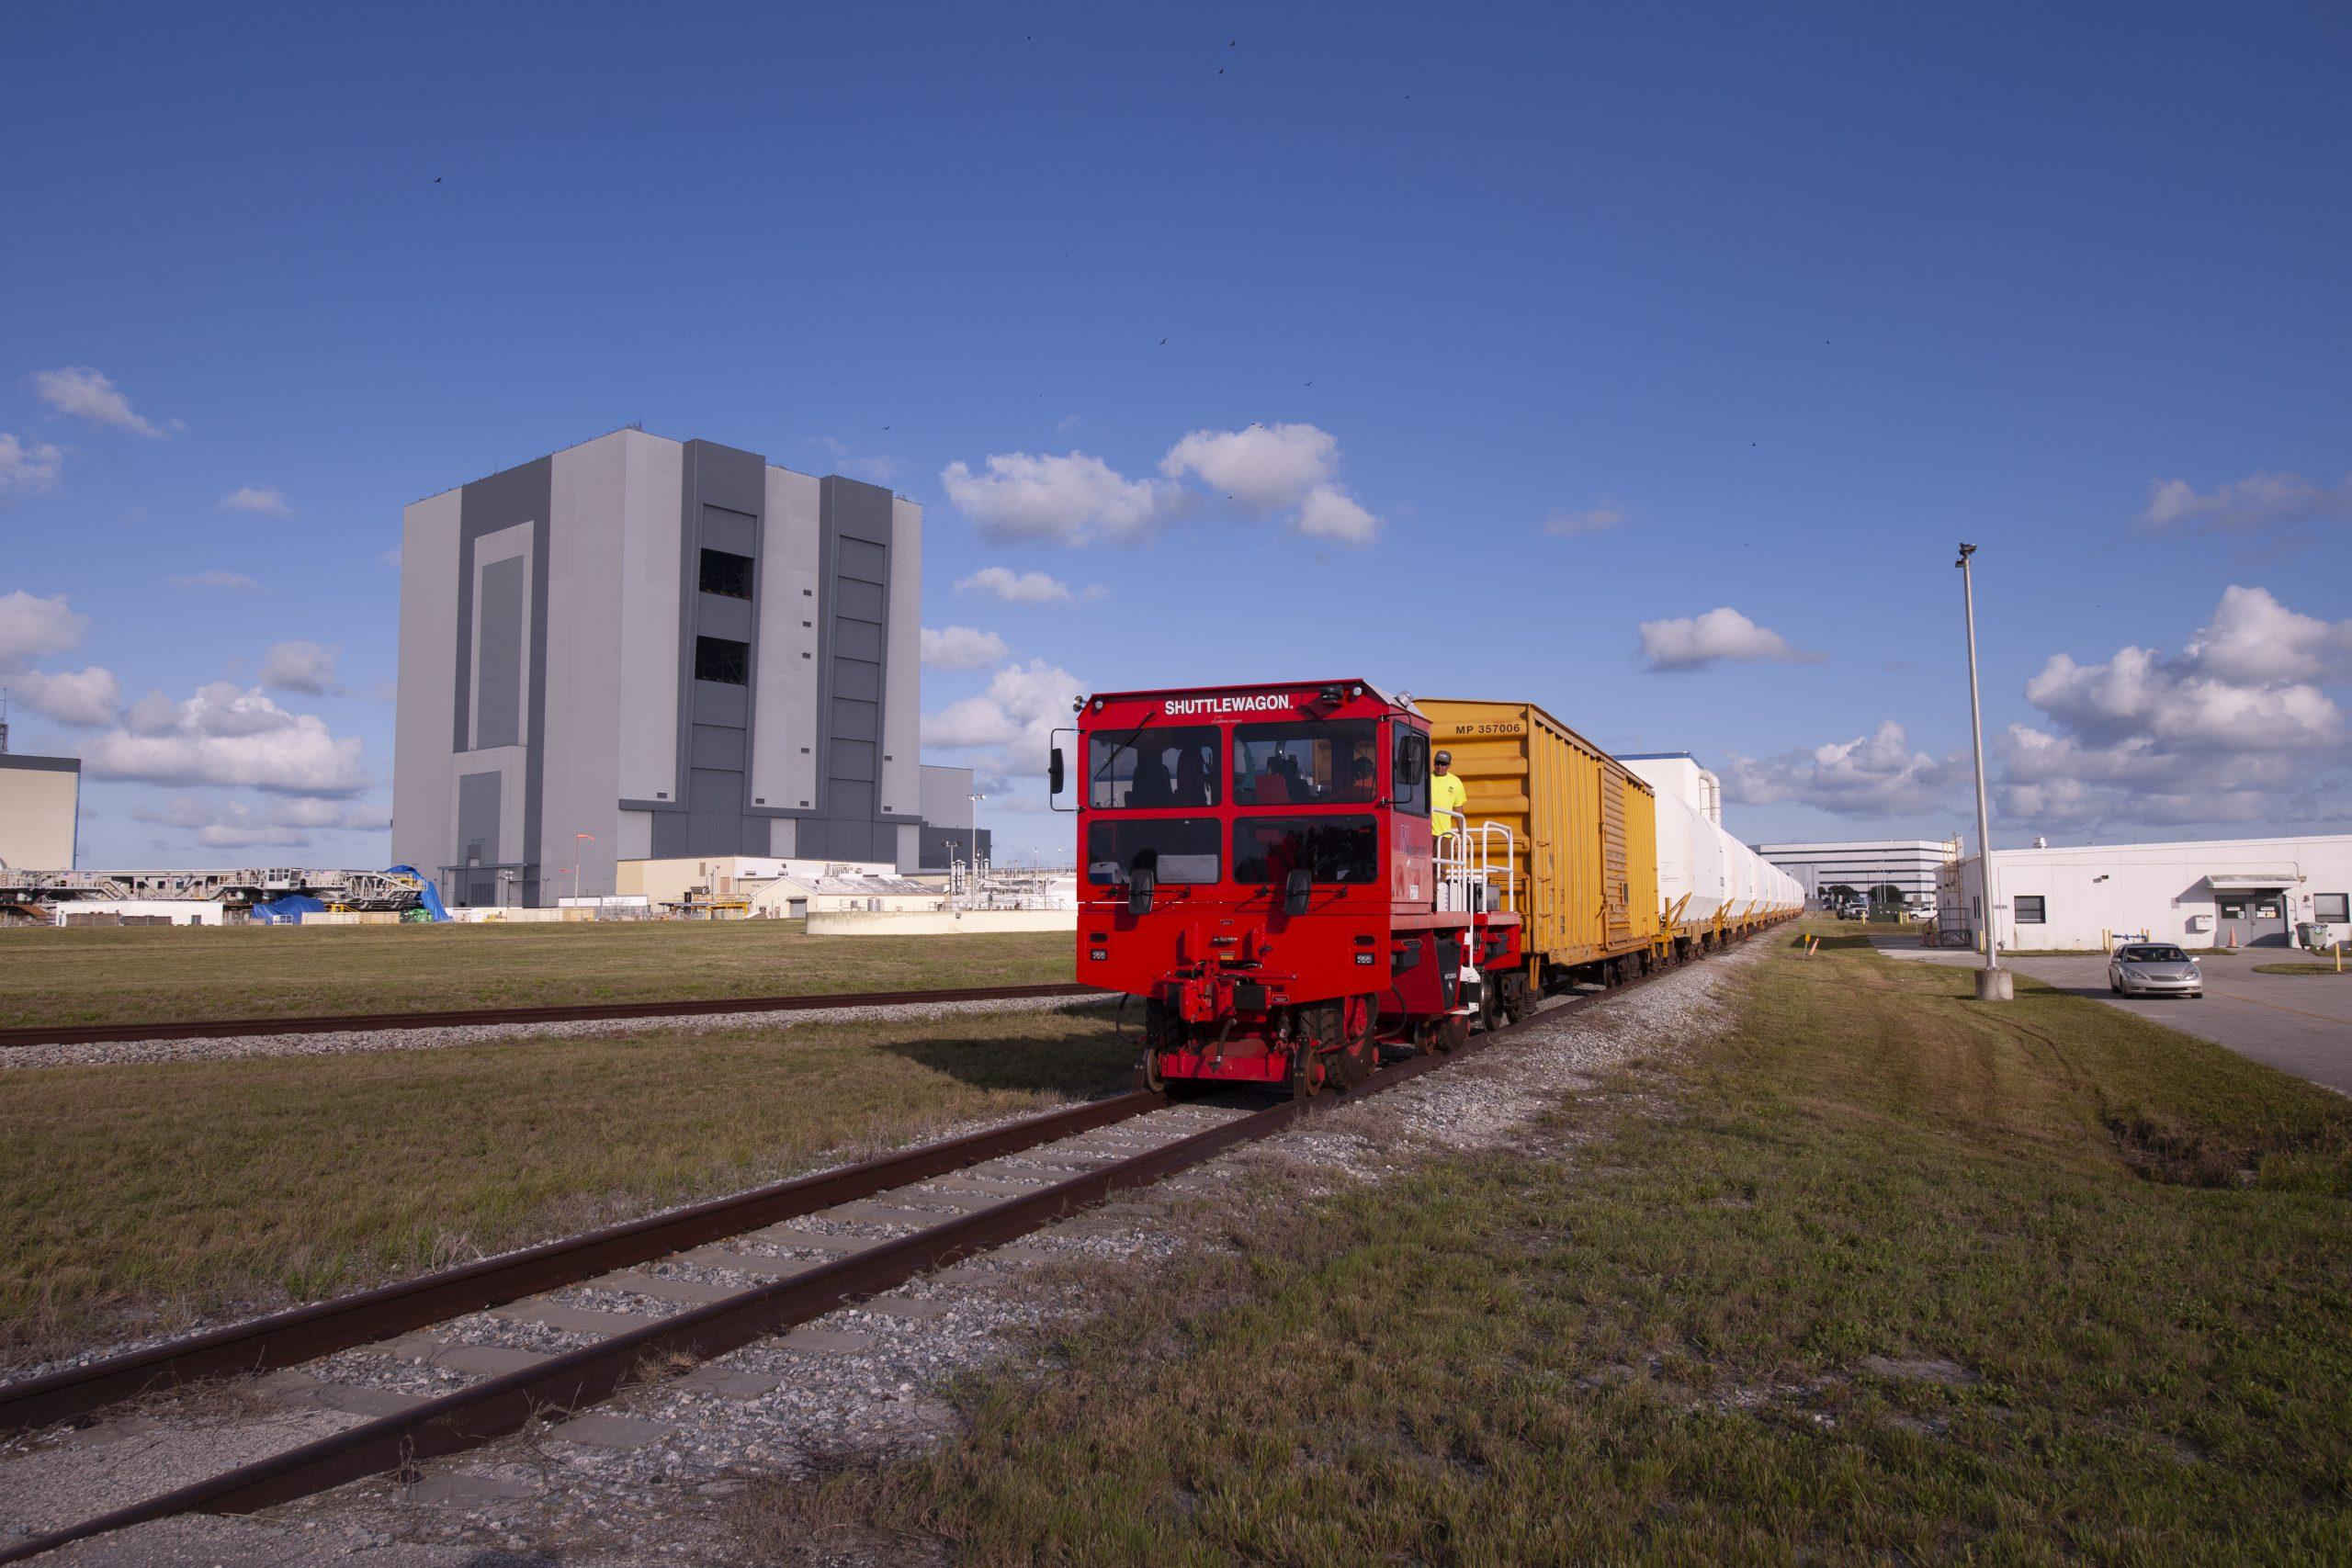 Rocket Motors for First NASA Artemis Moon Mission Arrive at Spaceport